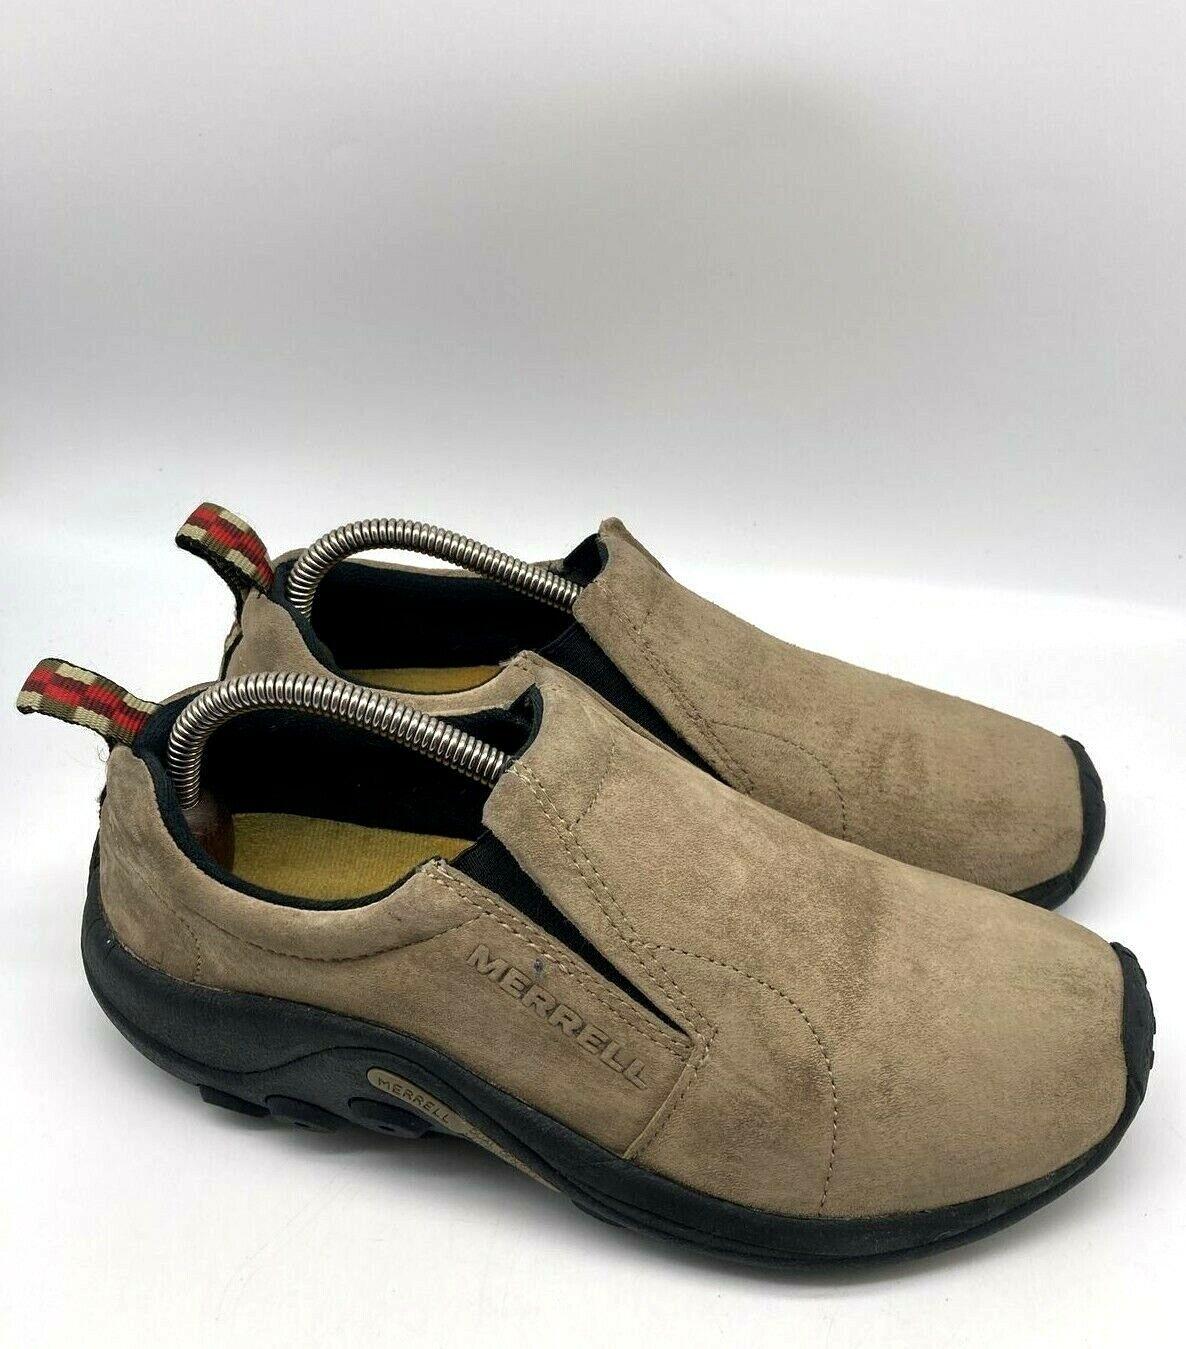 Merrell Jungle Moc Chaussures Femme à Enfiler en daim chaussures de randonnée Marron Taille 9.5 EU 40.5